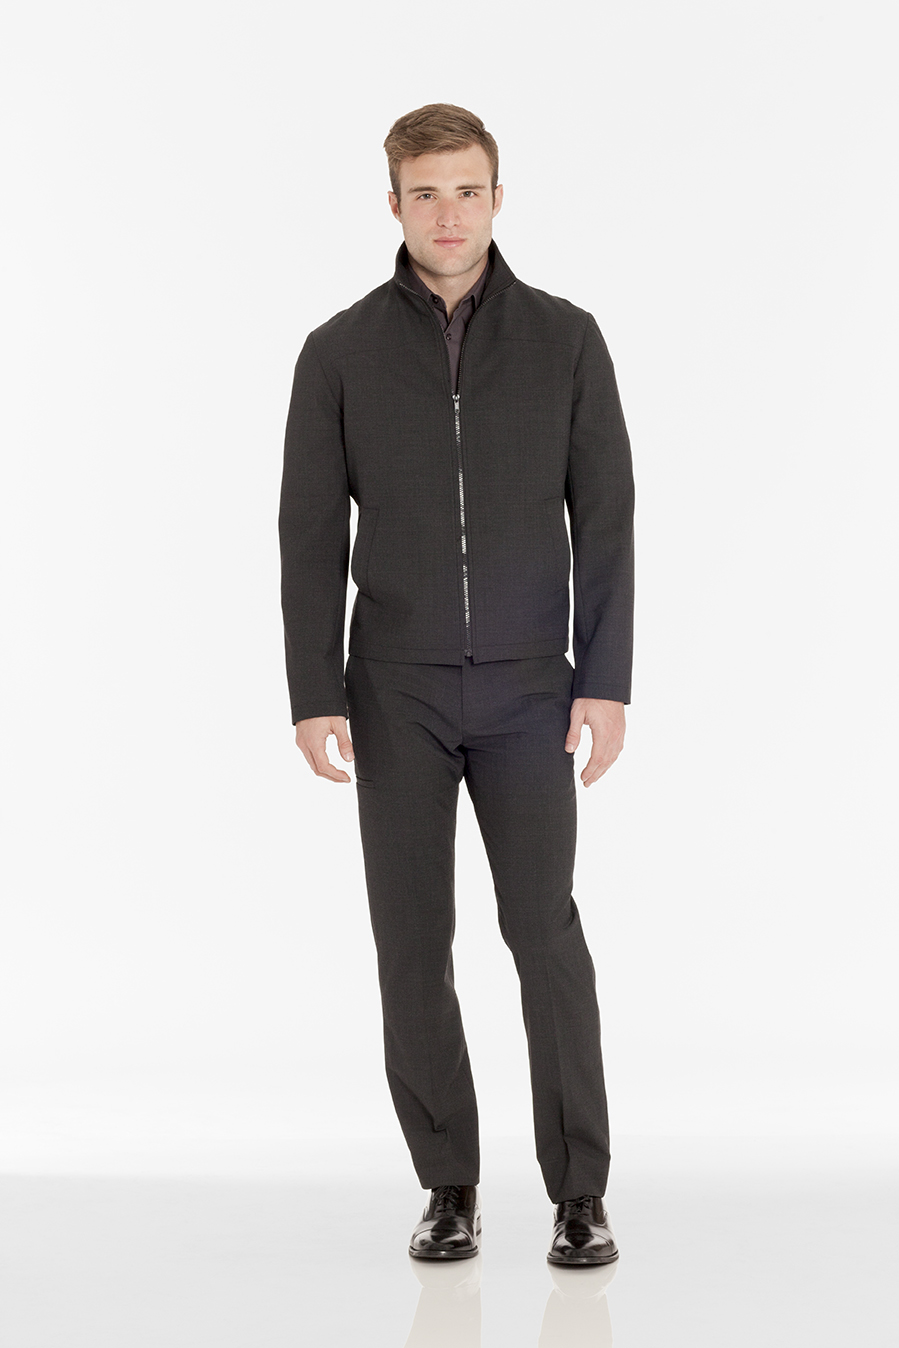 Jacket 405 Shirt 1071 Pant 283